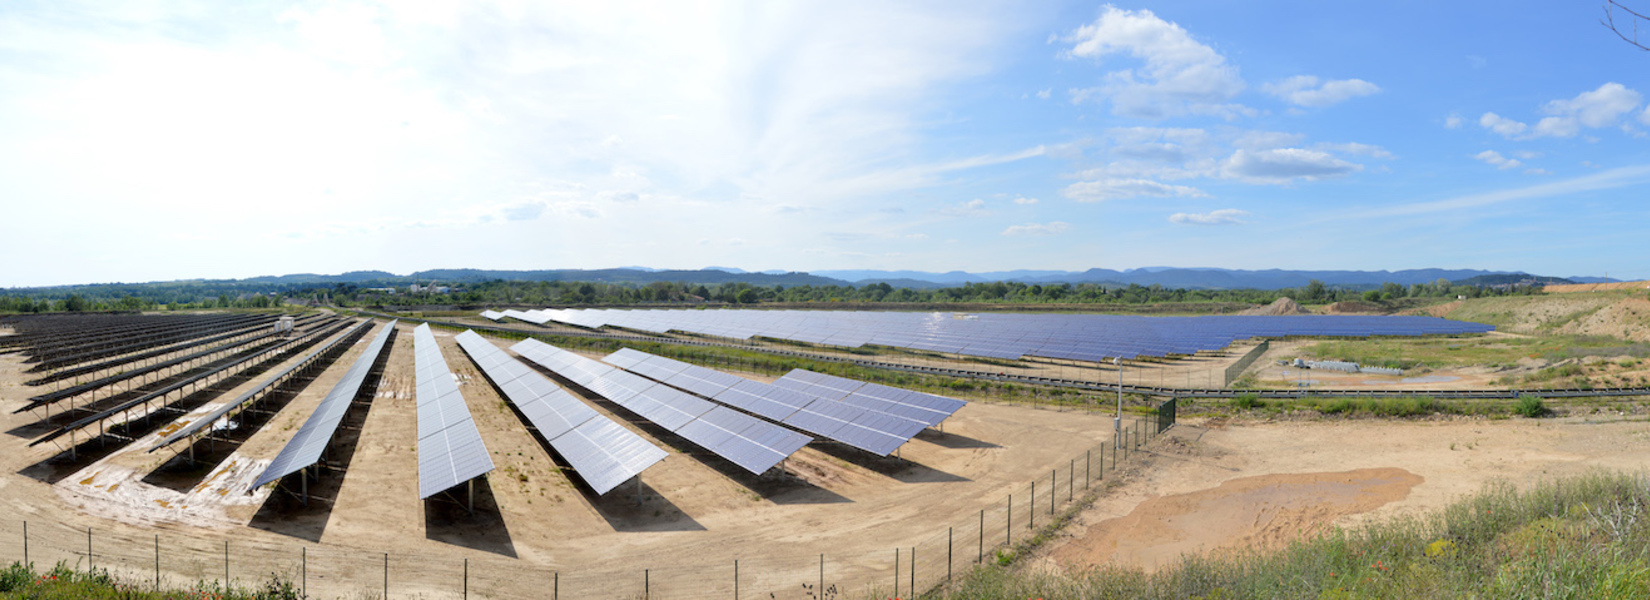 Pvs 34 thezan solar